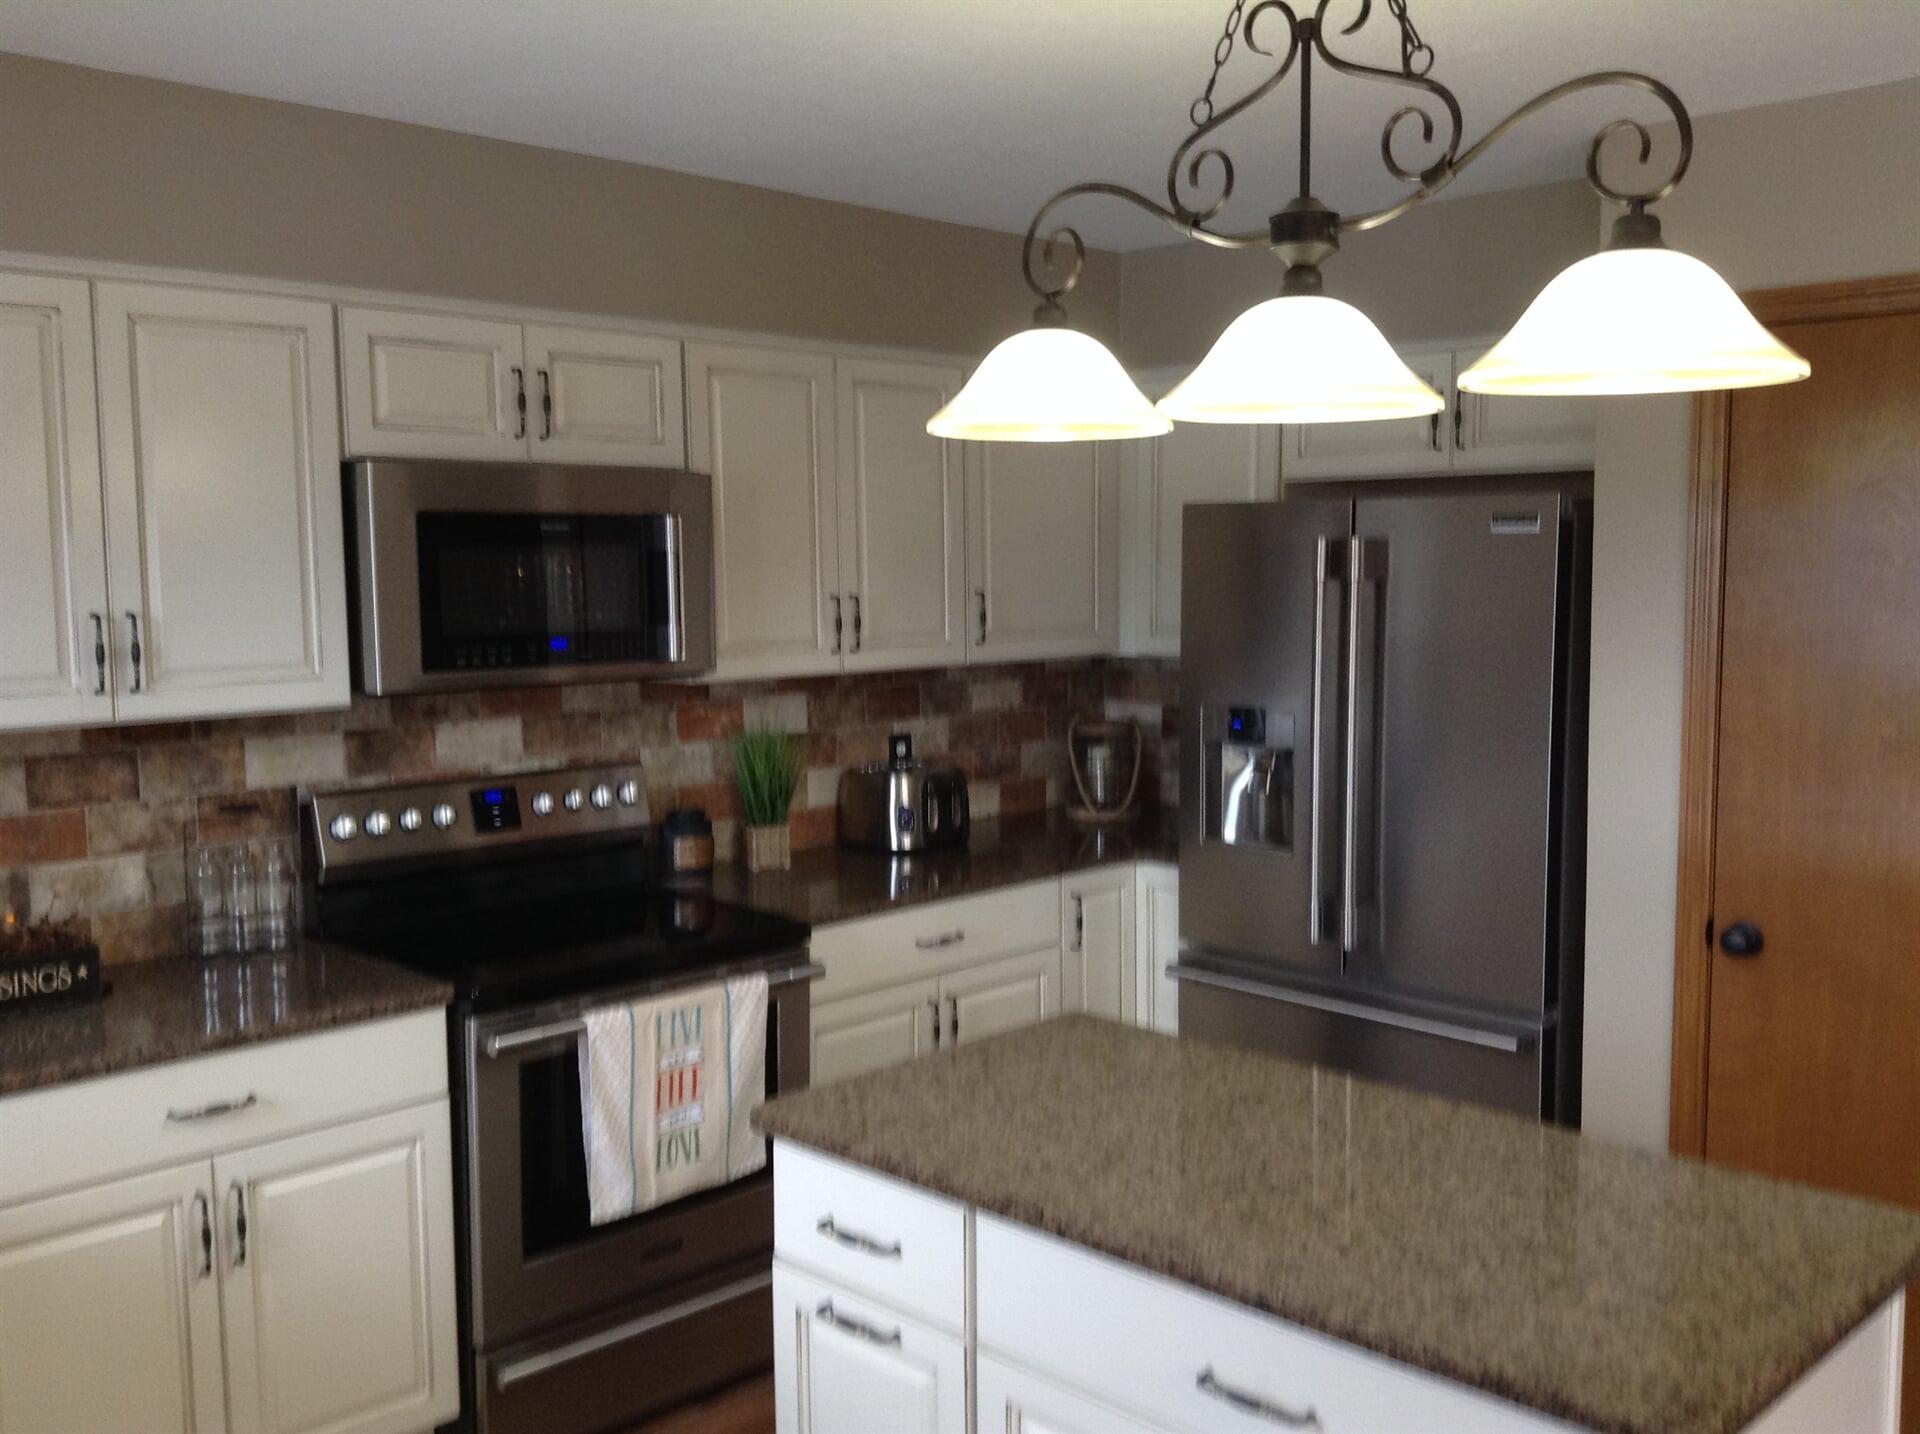 Elegant kitchen remodel with stone backsplash in Flat Rock, MI